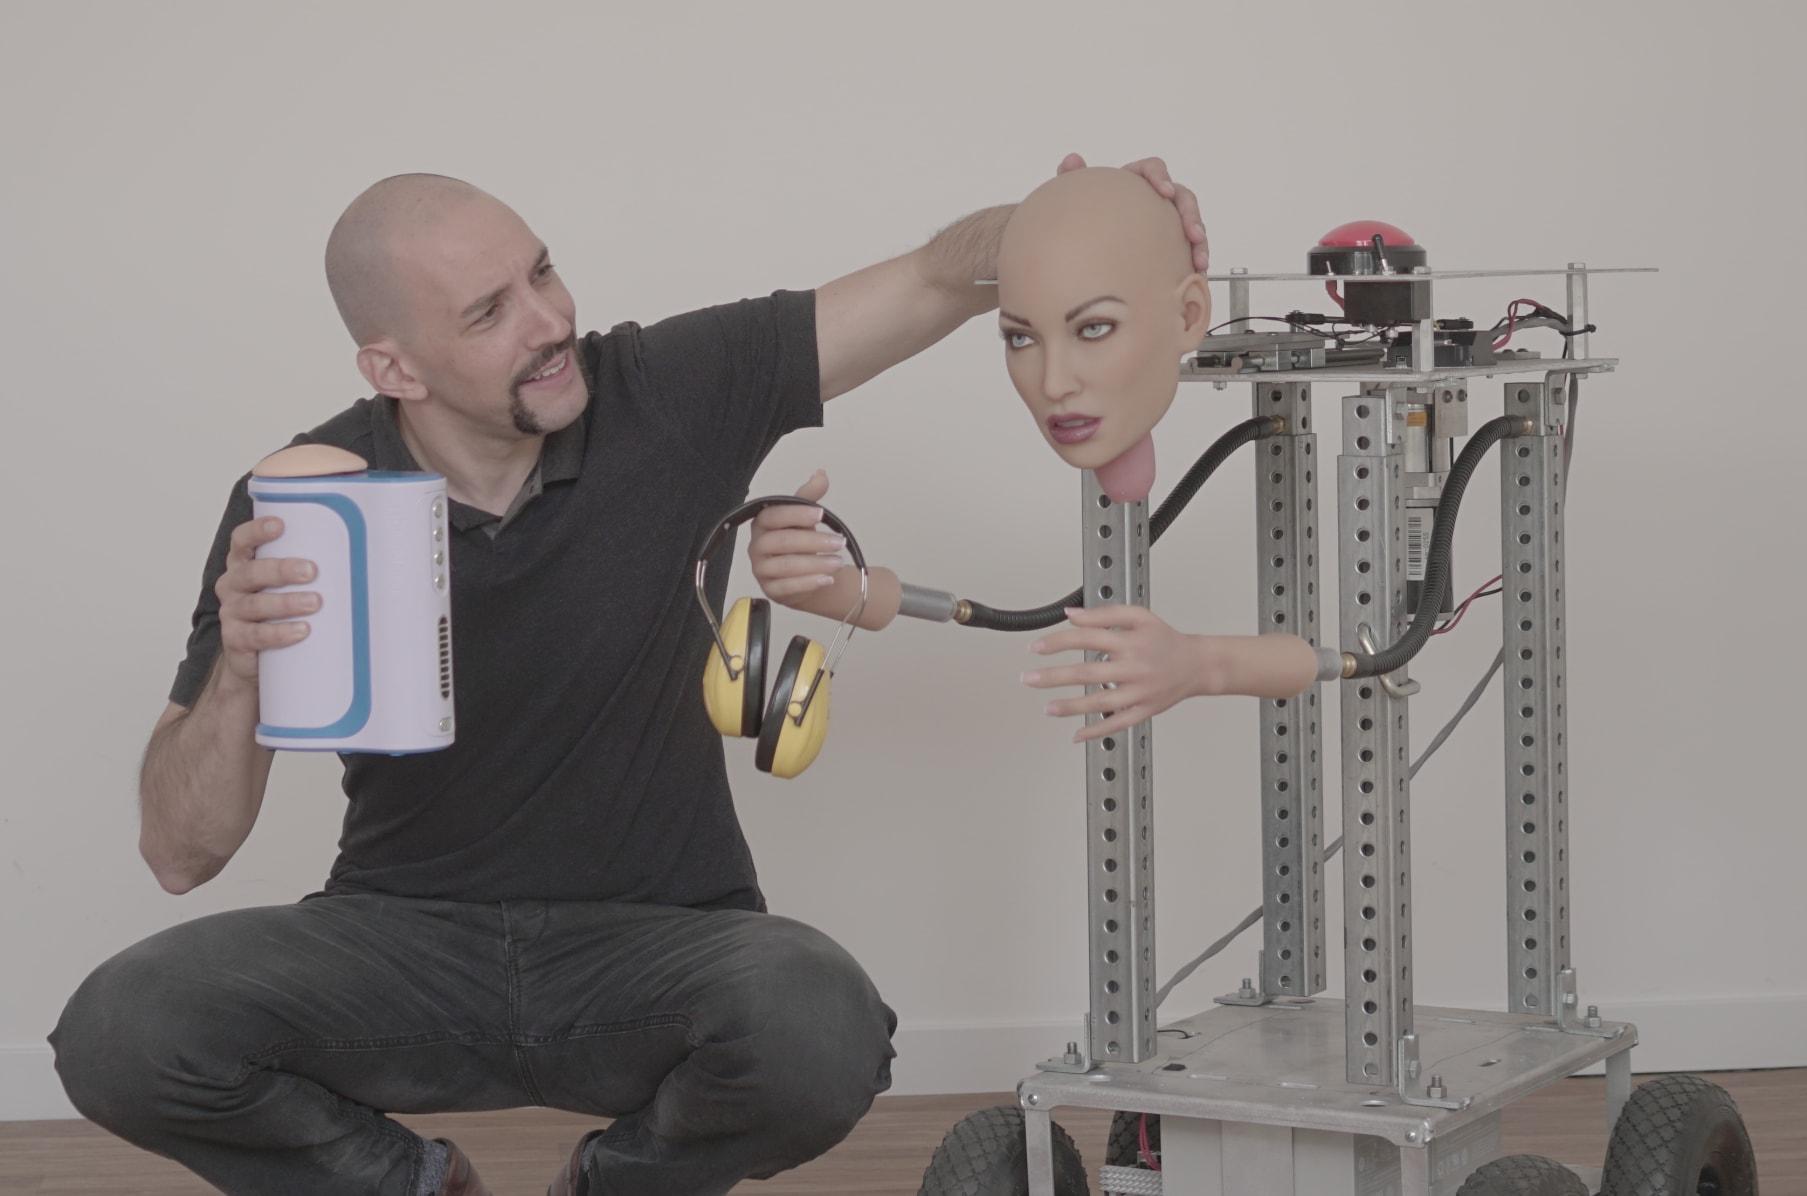 Autoblow Video autoblow a.i. replicates human oral sex techniques   indiegogo